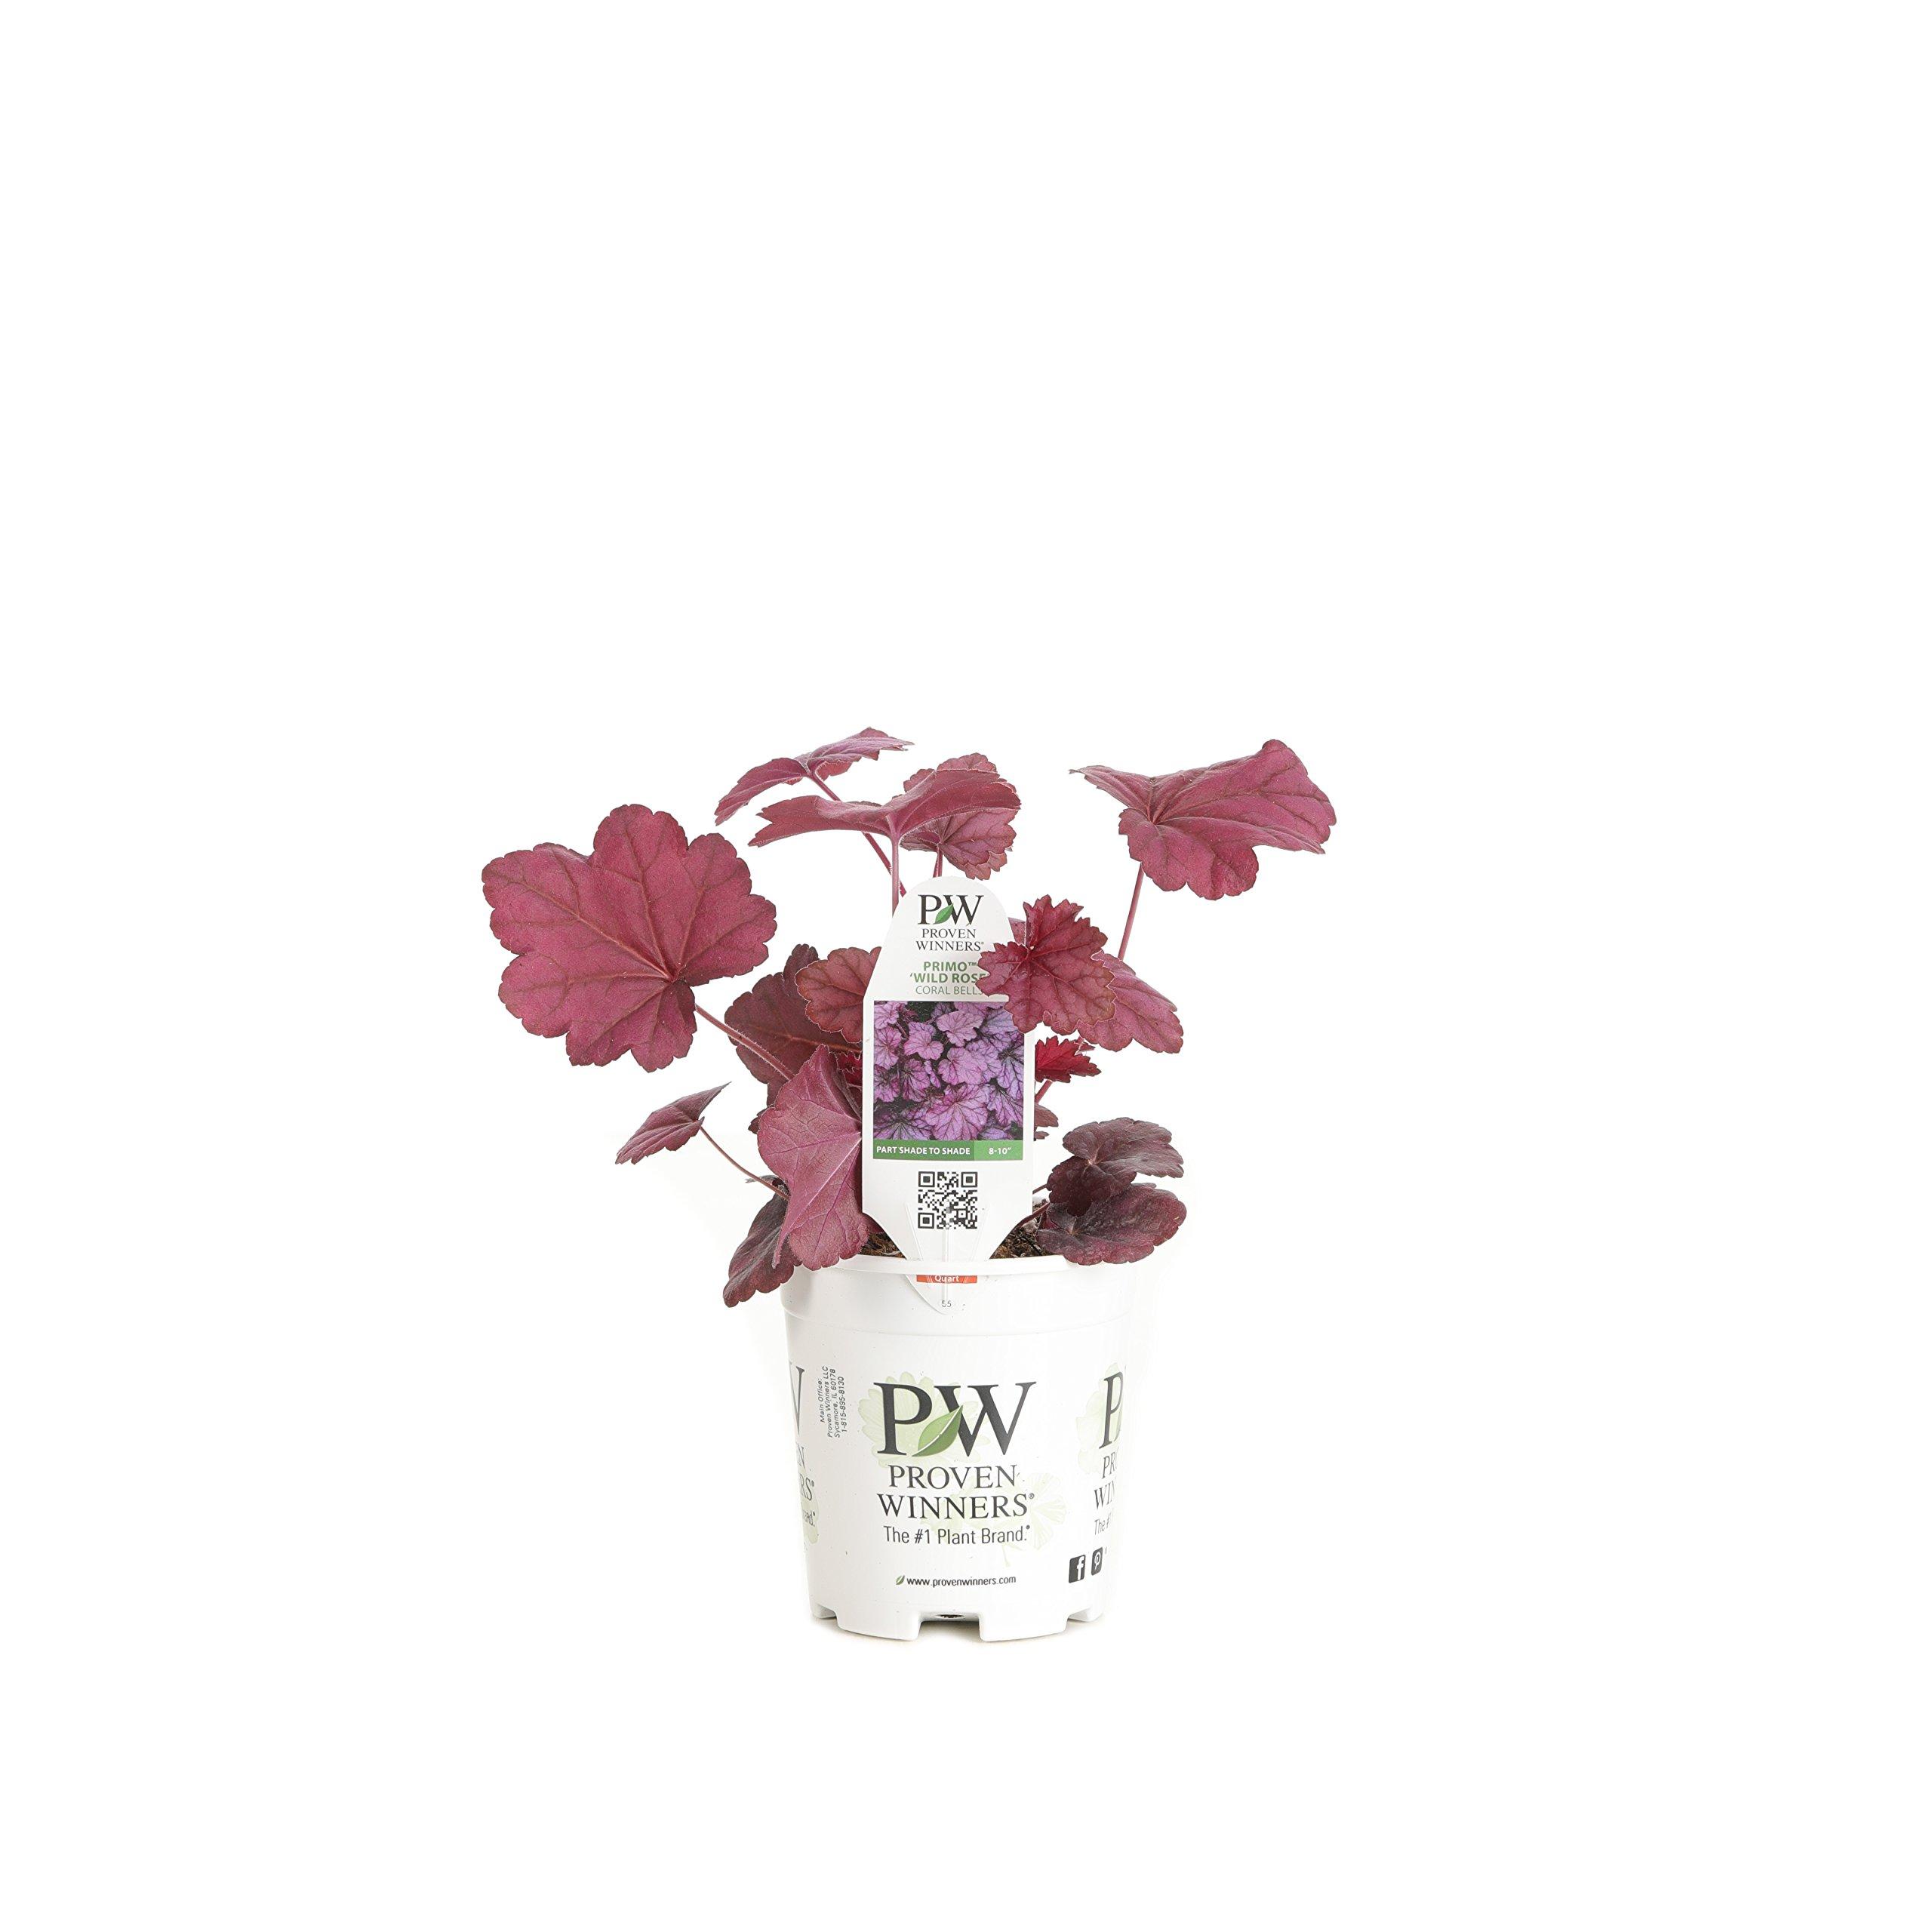 Proven Winners HEUPWP2527800 Primo Wild Rose Live Plants